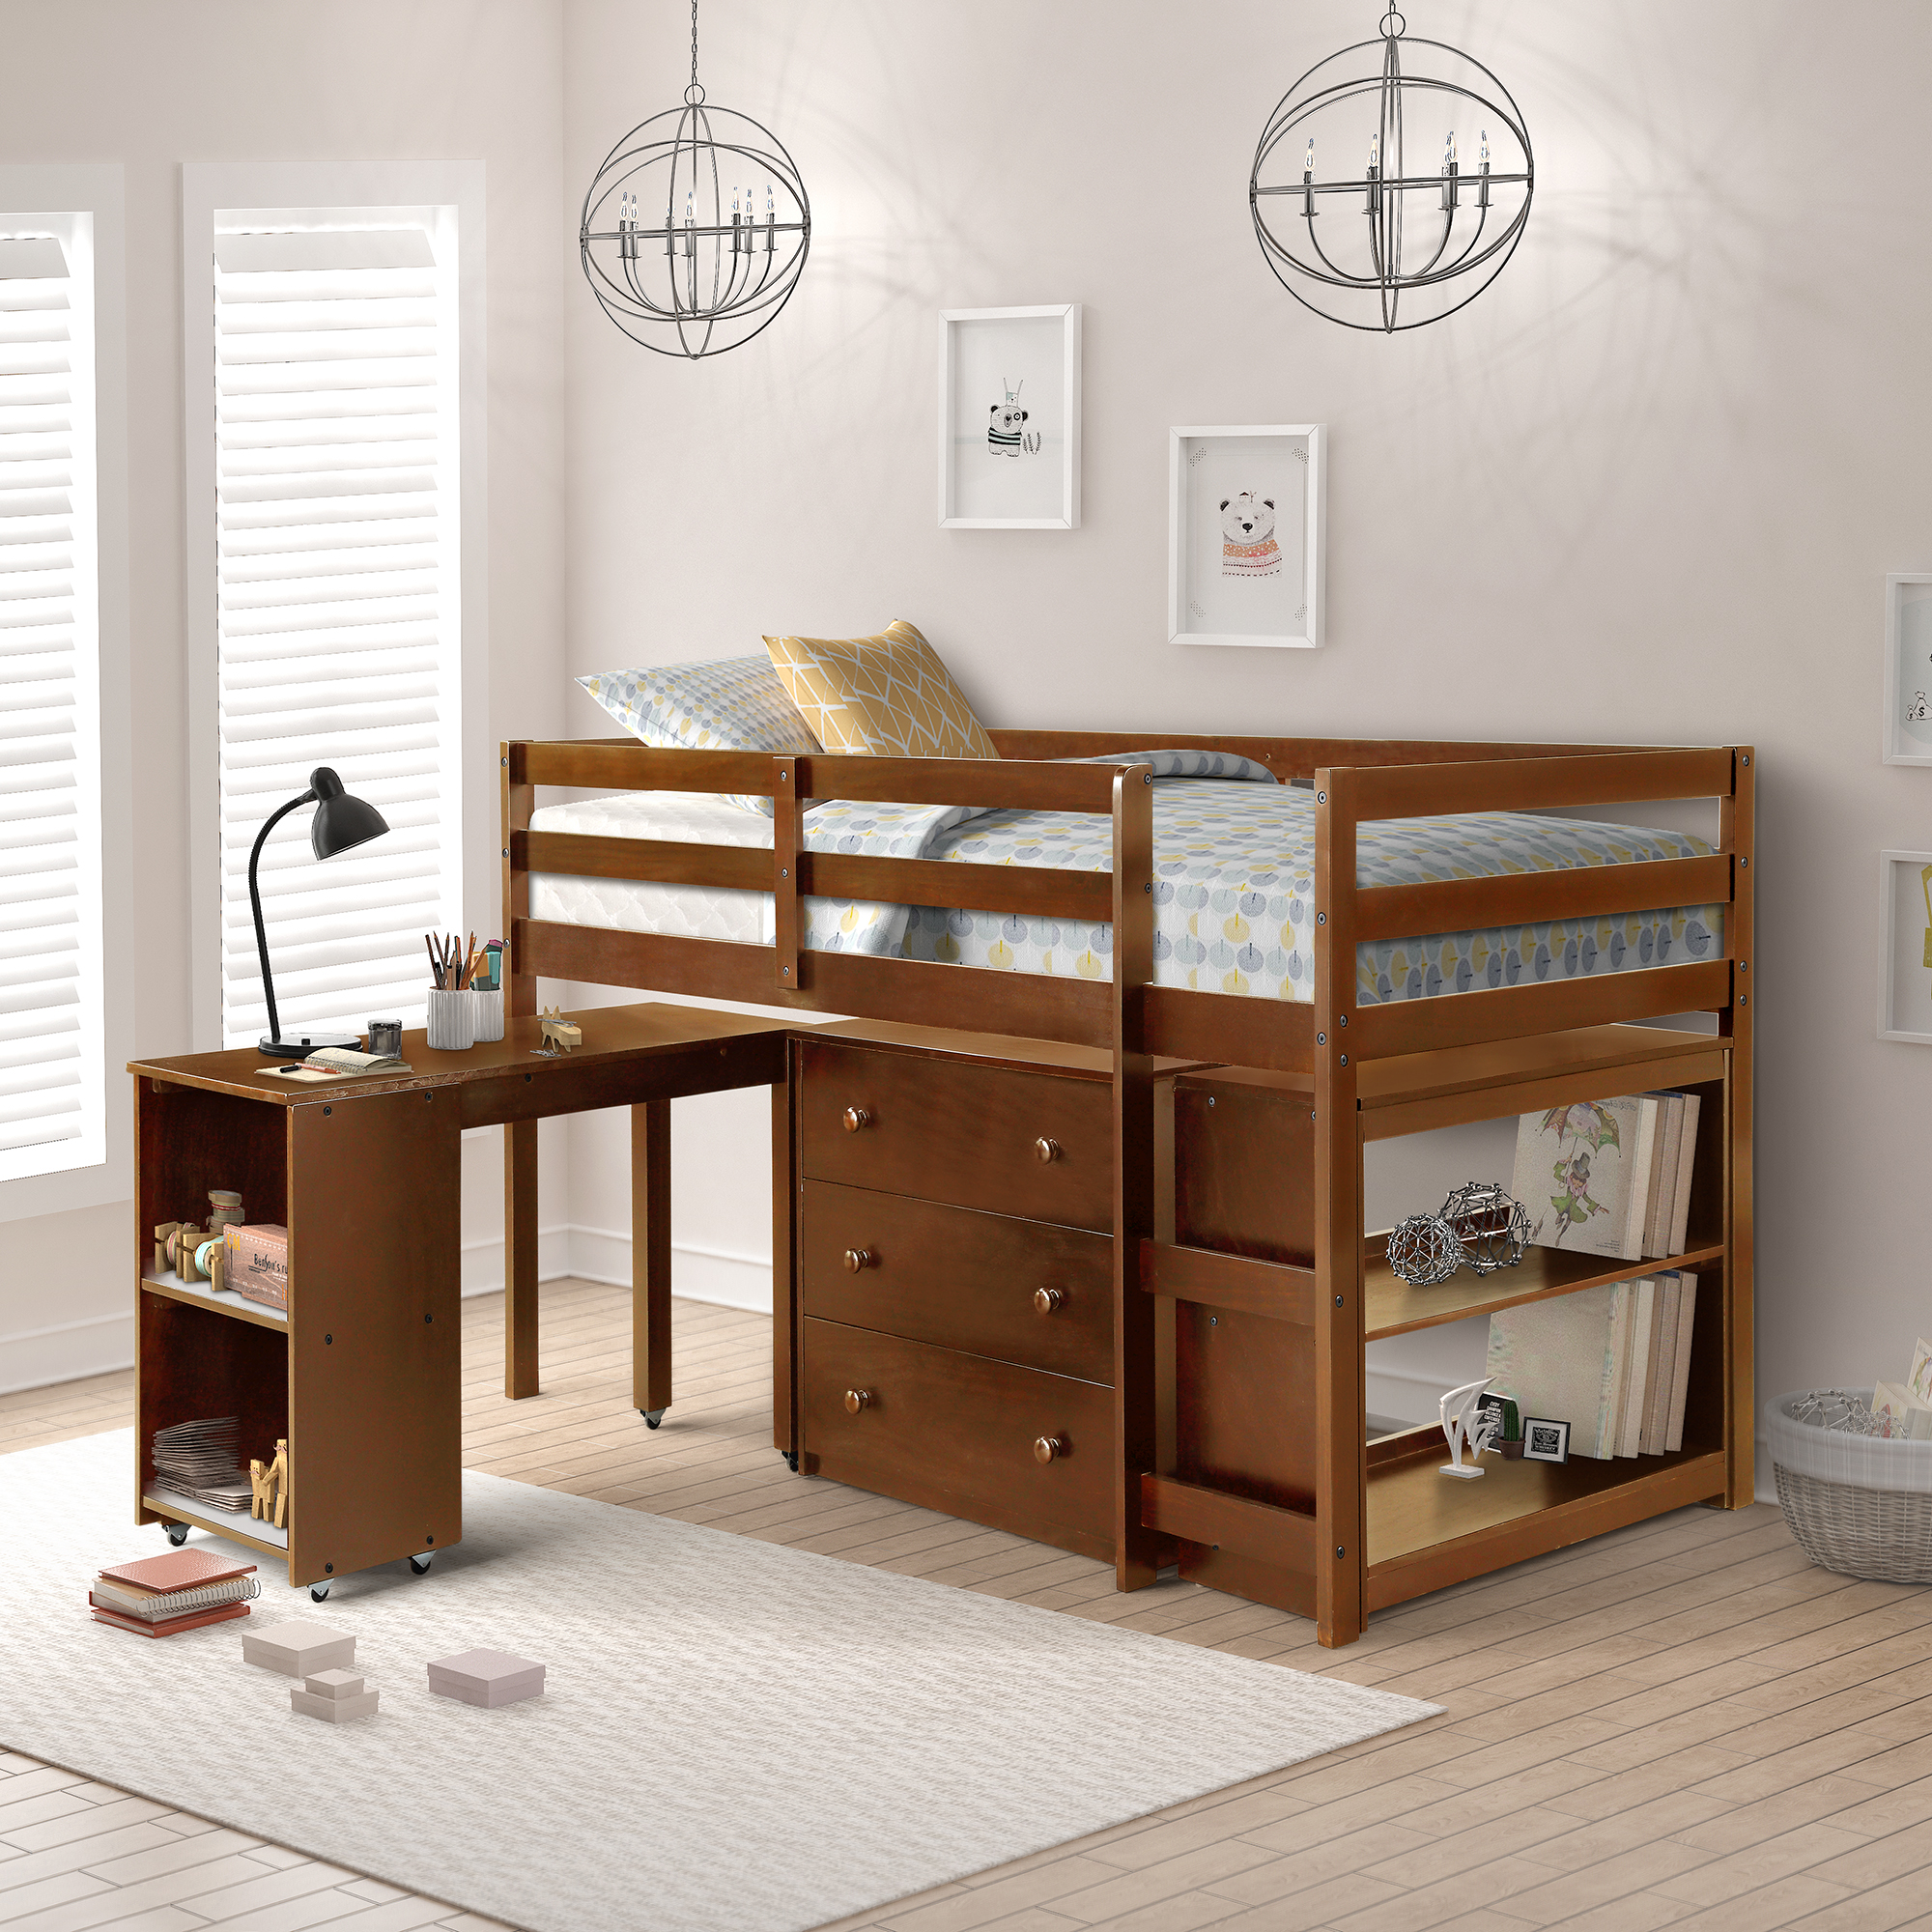 Harper Bright Designs 4 Piece Wood Twin Loft Bed With Desk Chest And Shelf Multiple Storage Espresso